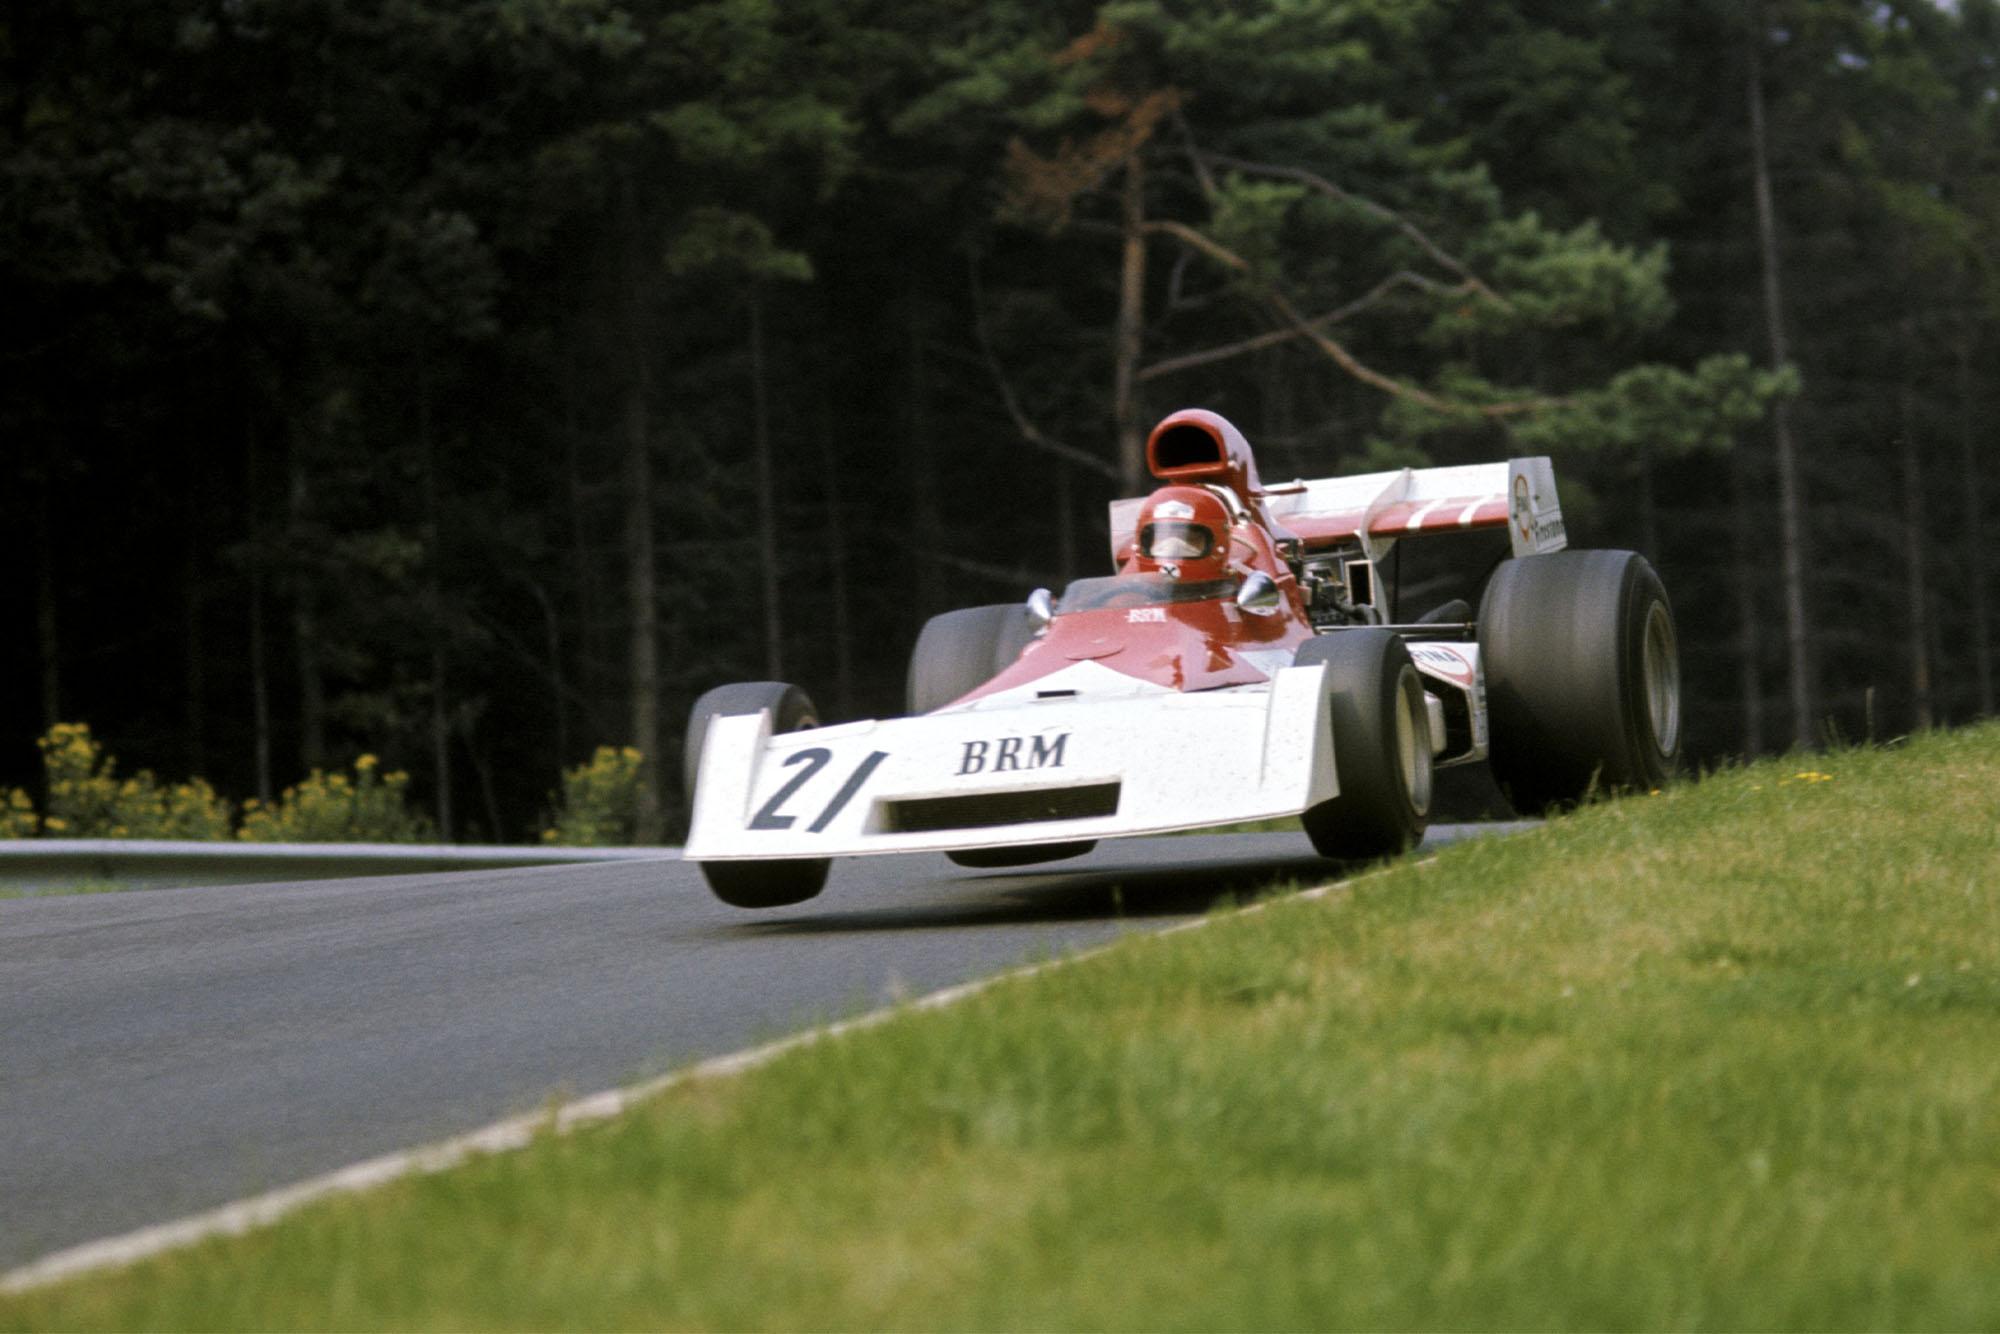 March driver Niki Lauda takes flight on the Flugplatz.